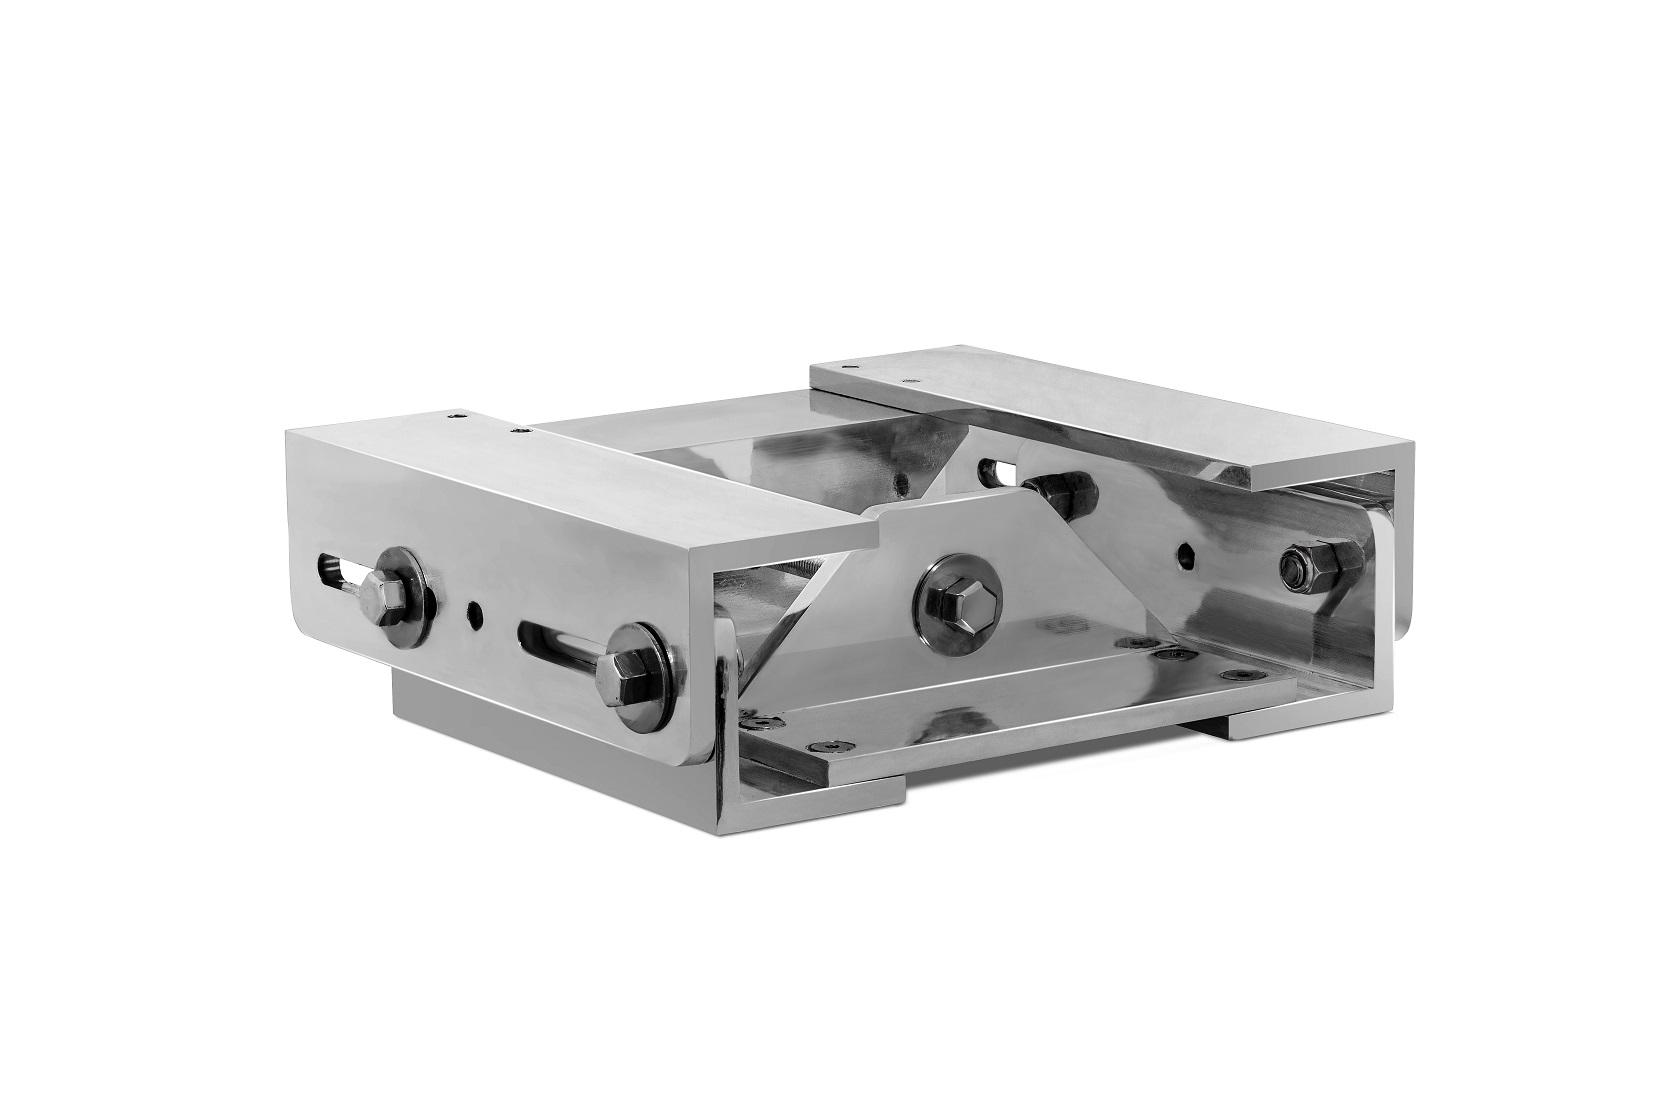 Suporte para Motor de Popa (Jack Plate) Alumínio 6 polegadas SPN